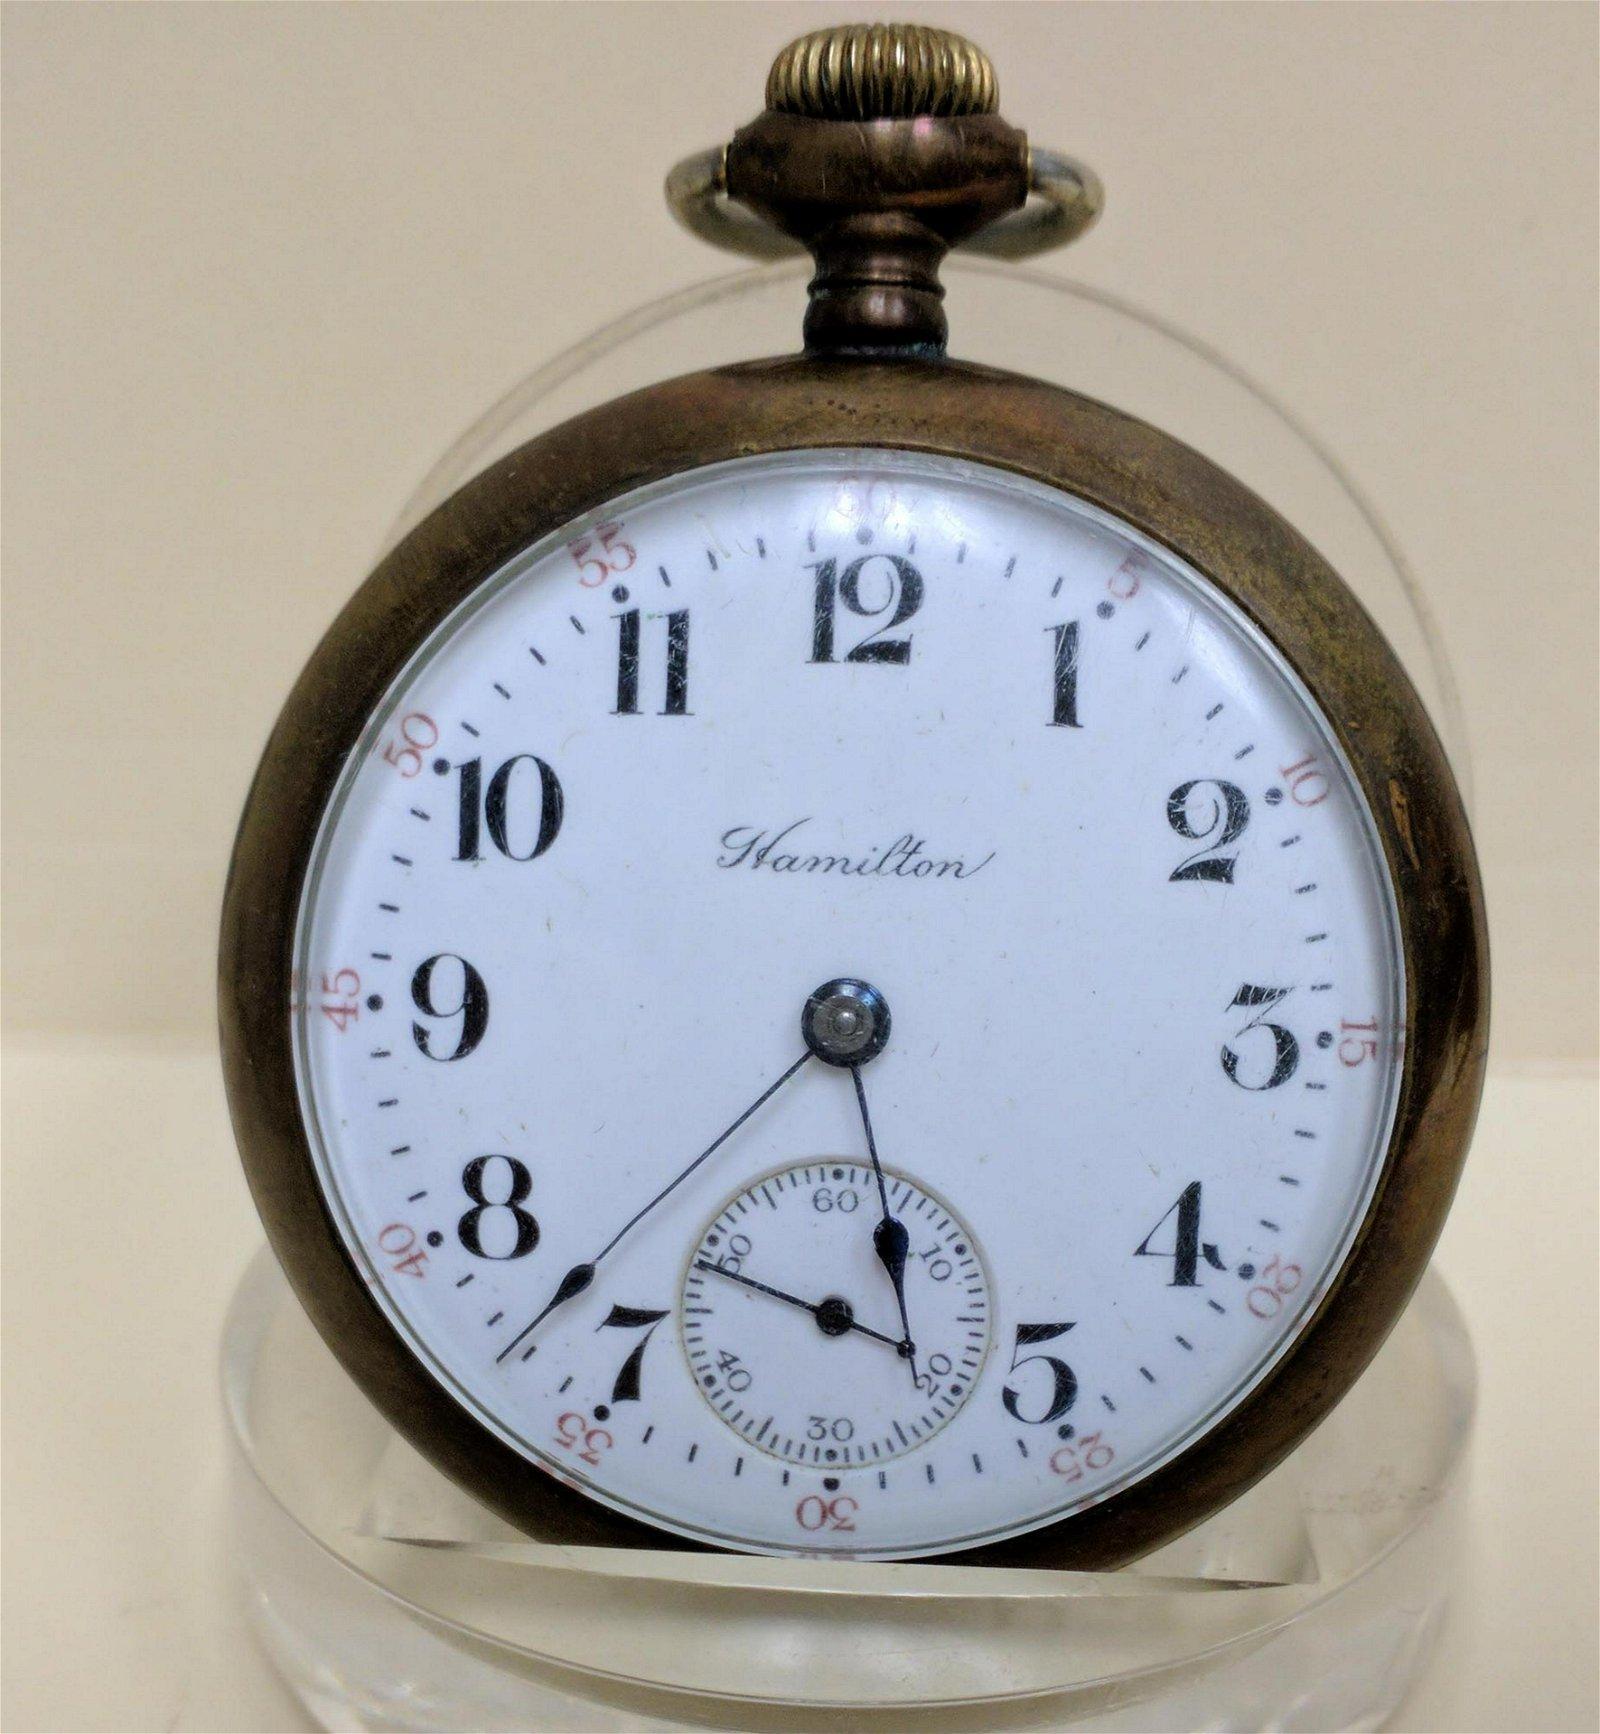 Pocket watch HAMILTON WATCH CO. LANCASTER PA Pocket